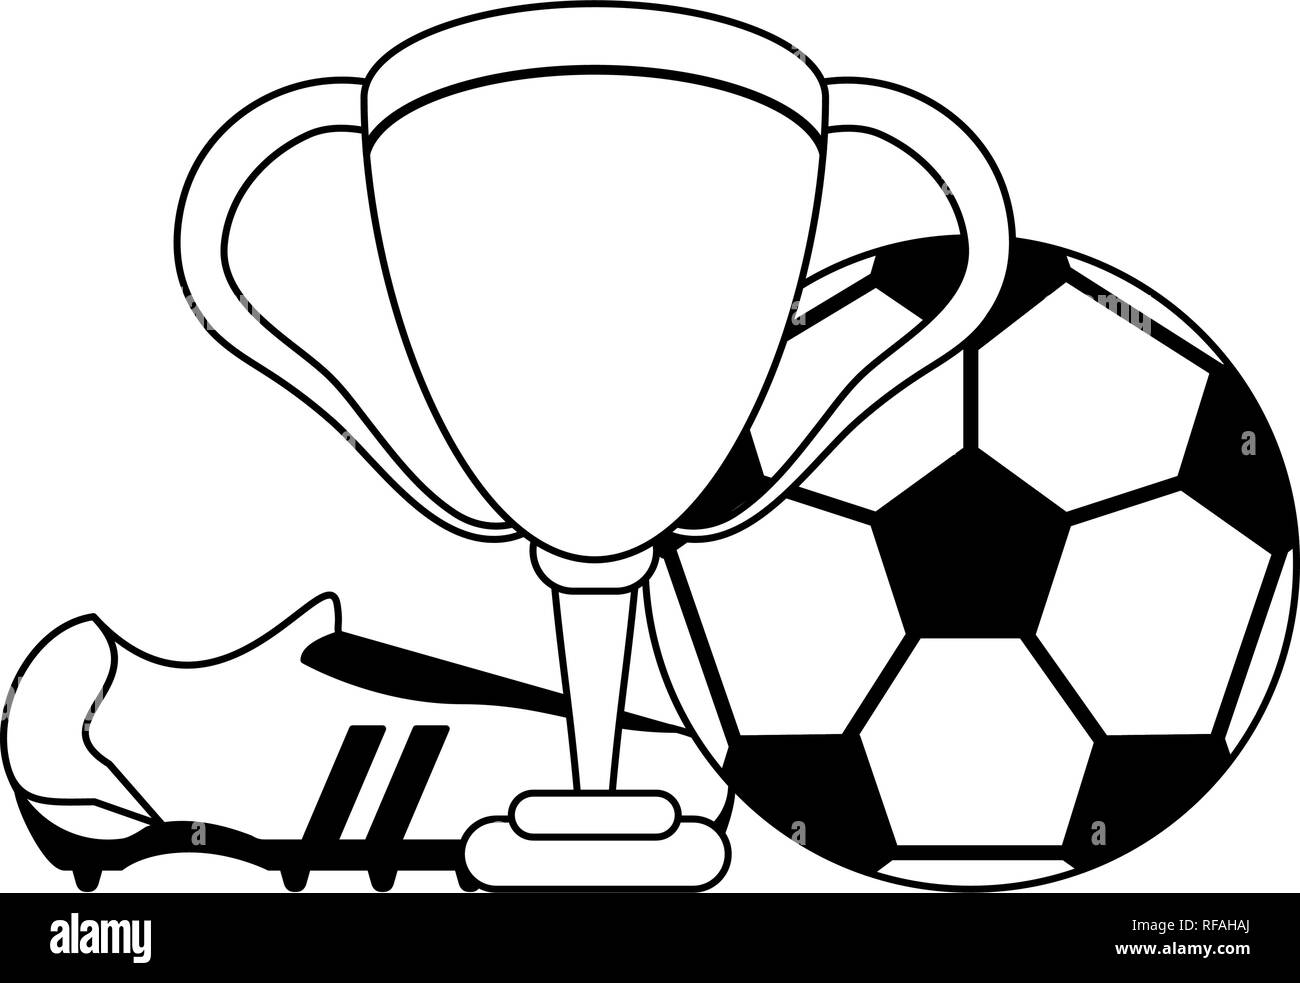 Soccer Game Sport In Black And White Stock Vector Art